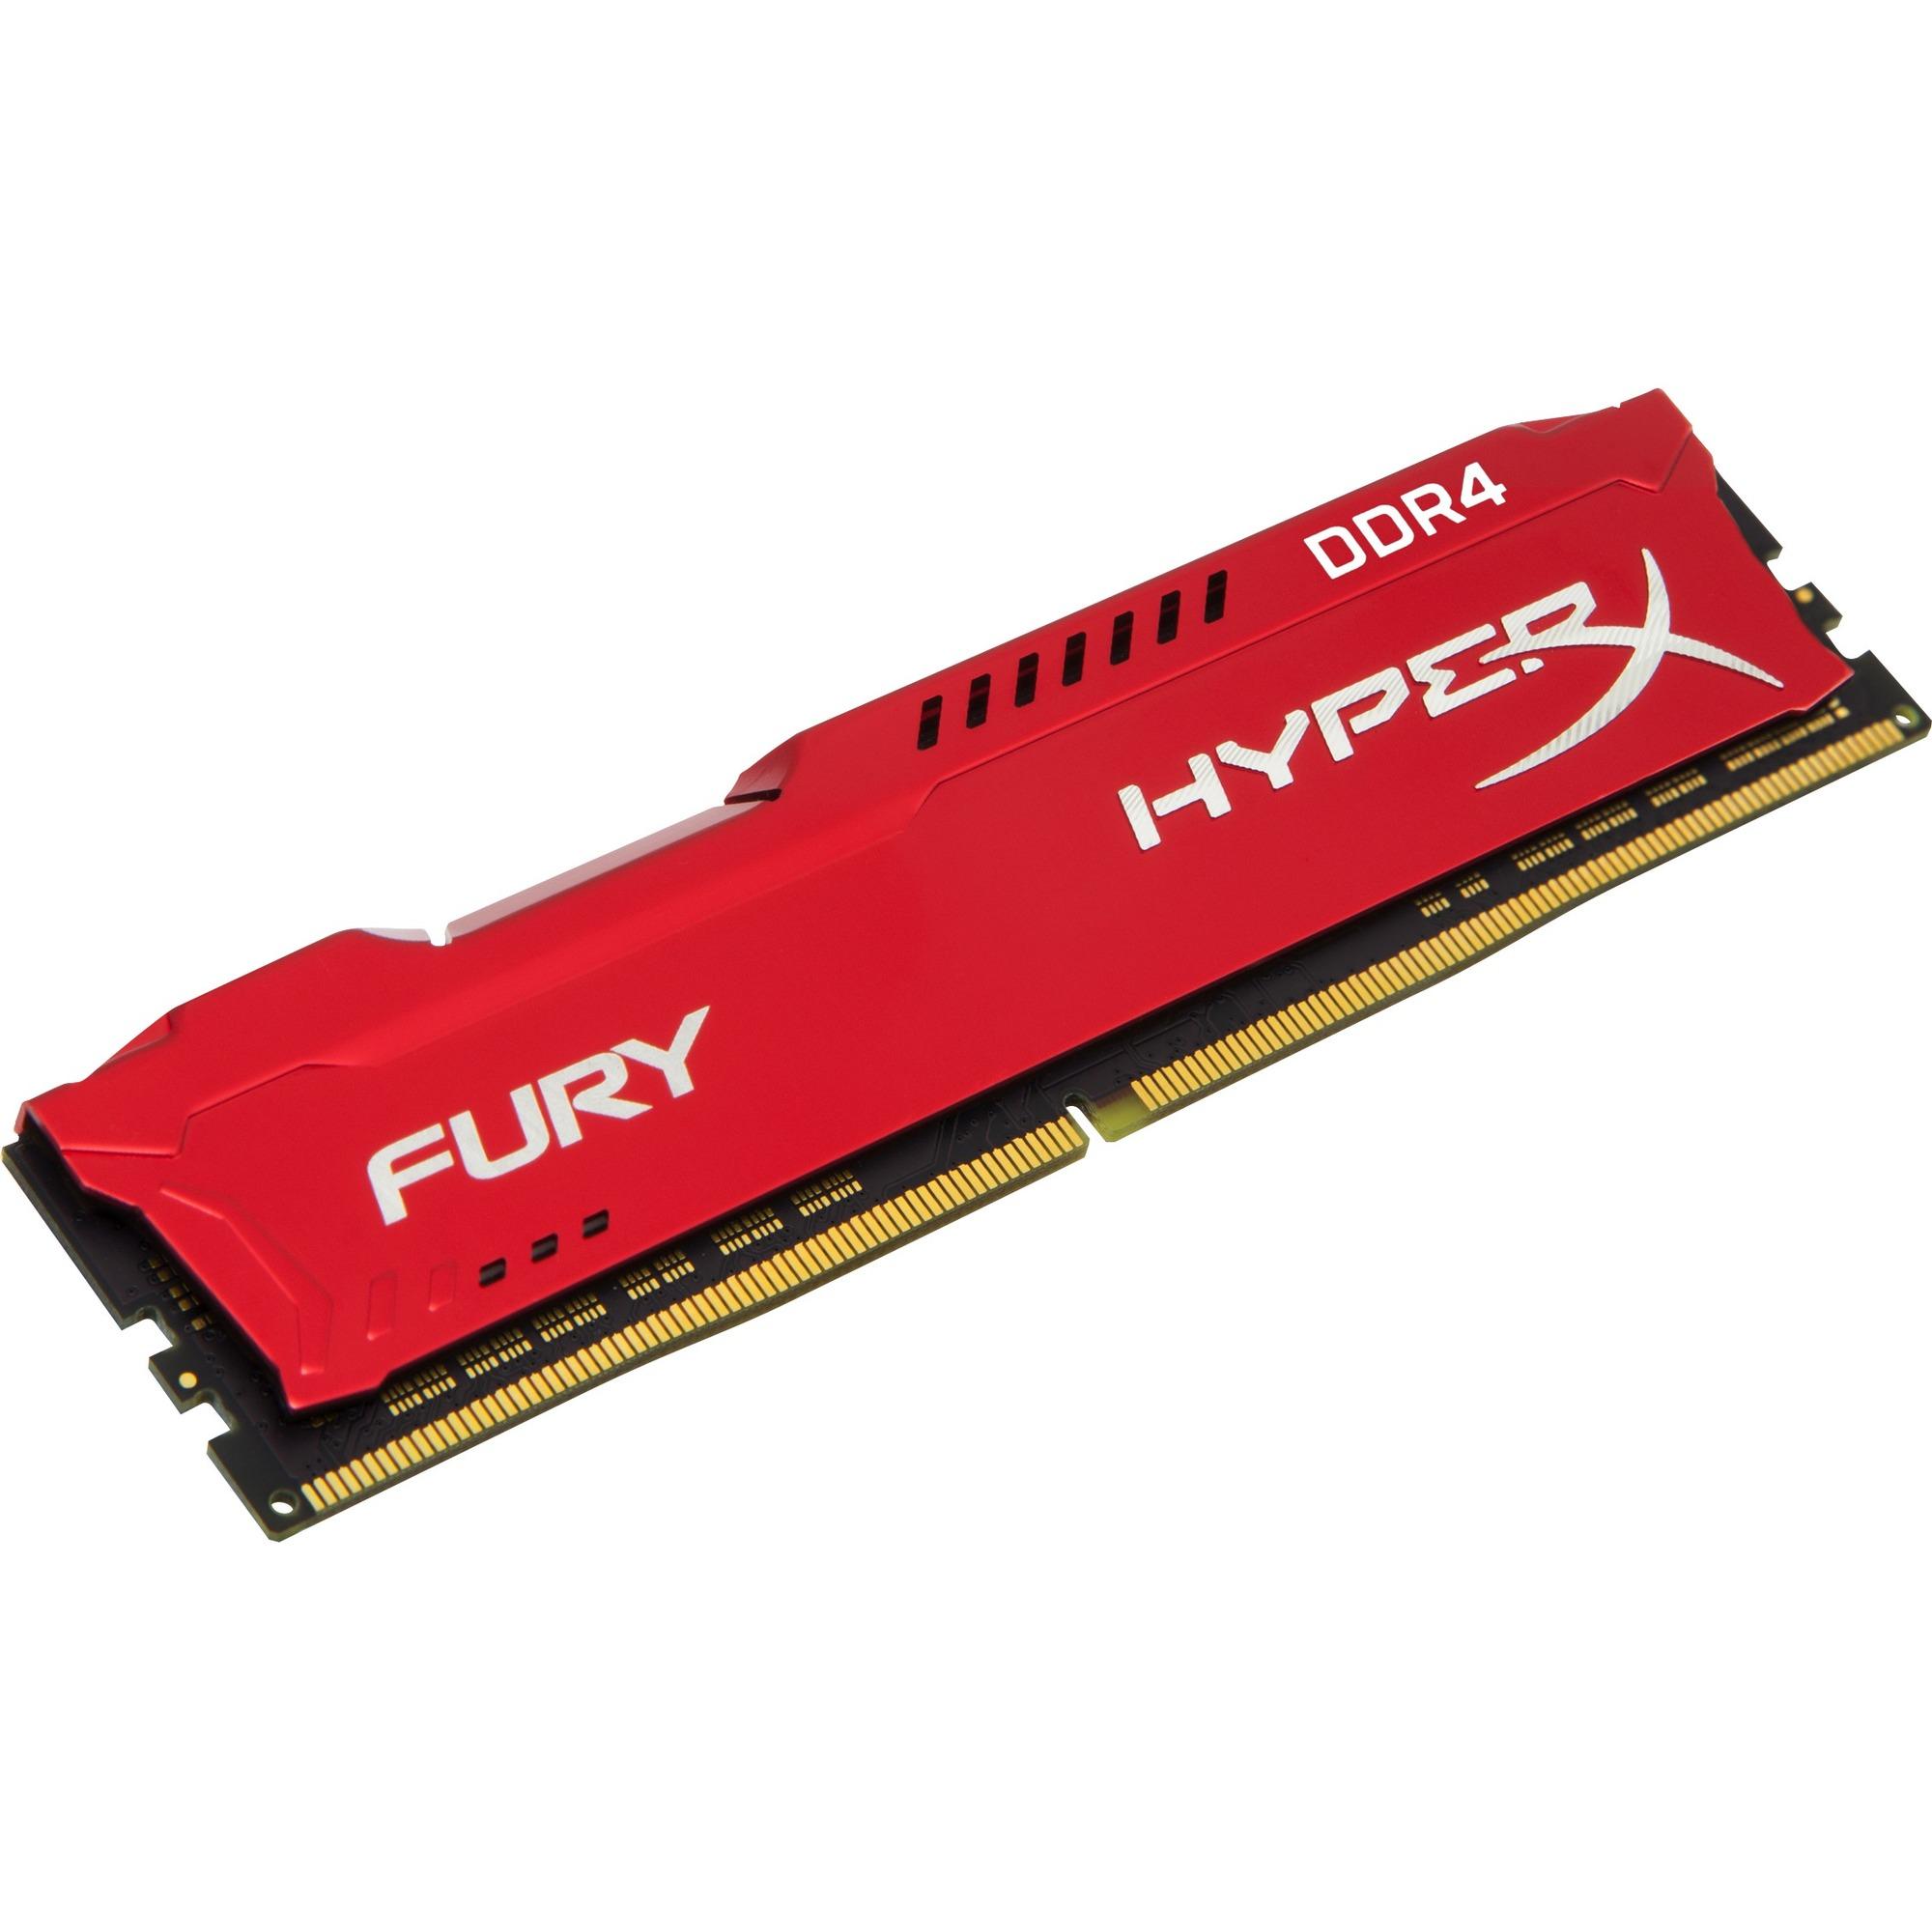 Kingston HyperX RAM Module - 16 GB - DDR4 SDRAM - 2400 MHz DDR4-2400/PC4-19200 - 1.20 V - Non-ECC - Unbuffered - CL15 - 288-pin - DIMM